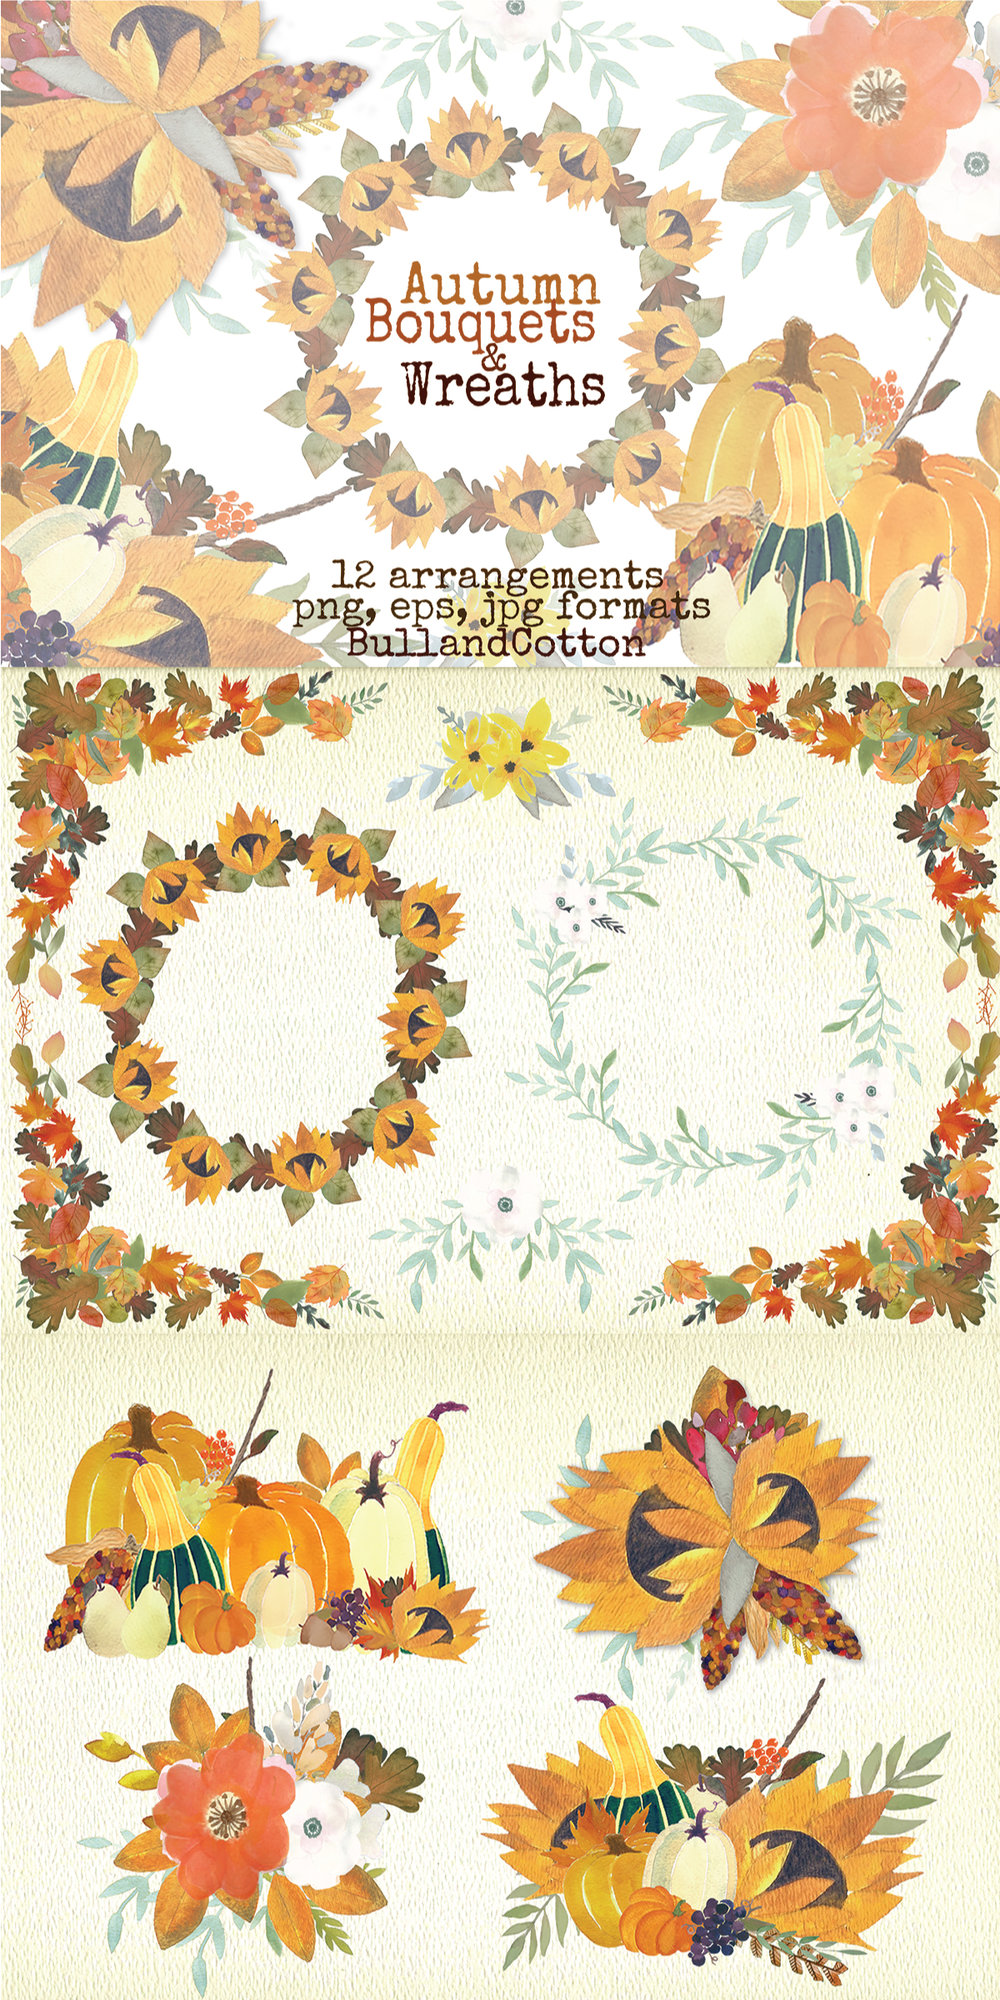 Autumn Bouquet Free Watercolor Illustrations